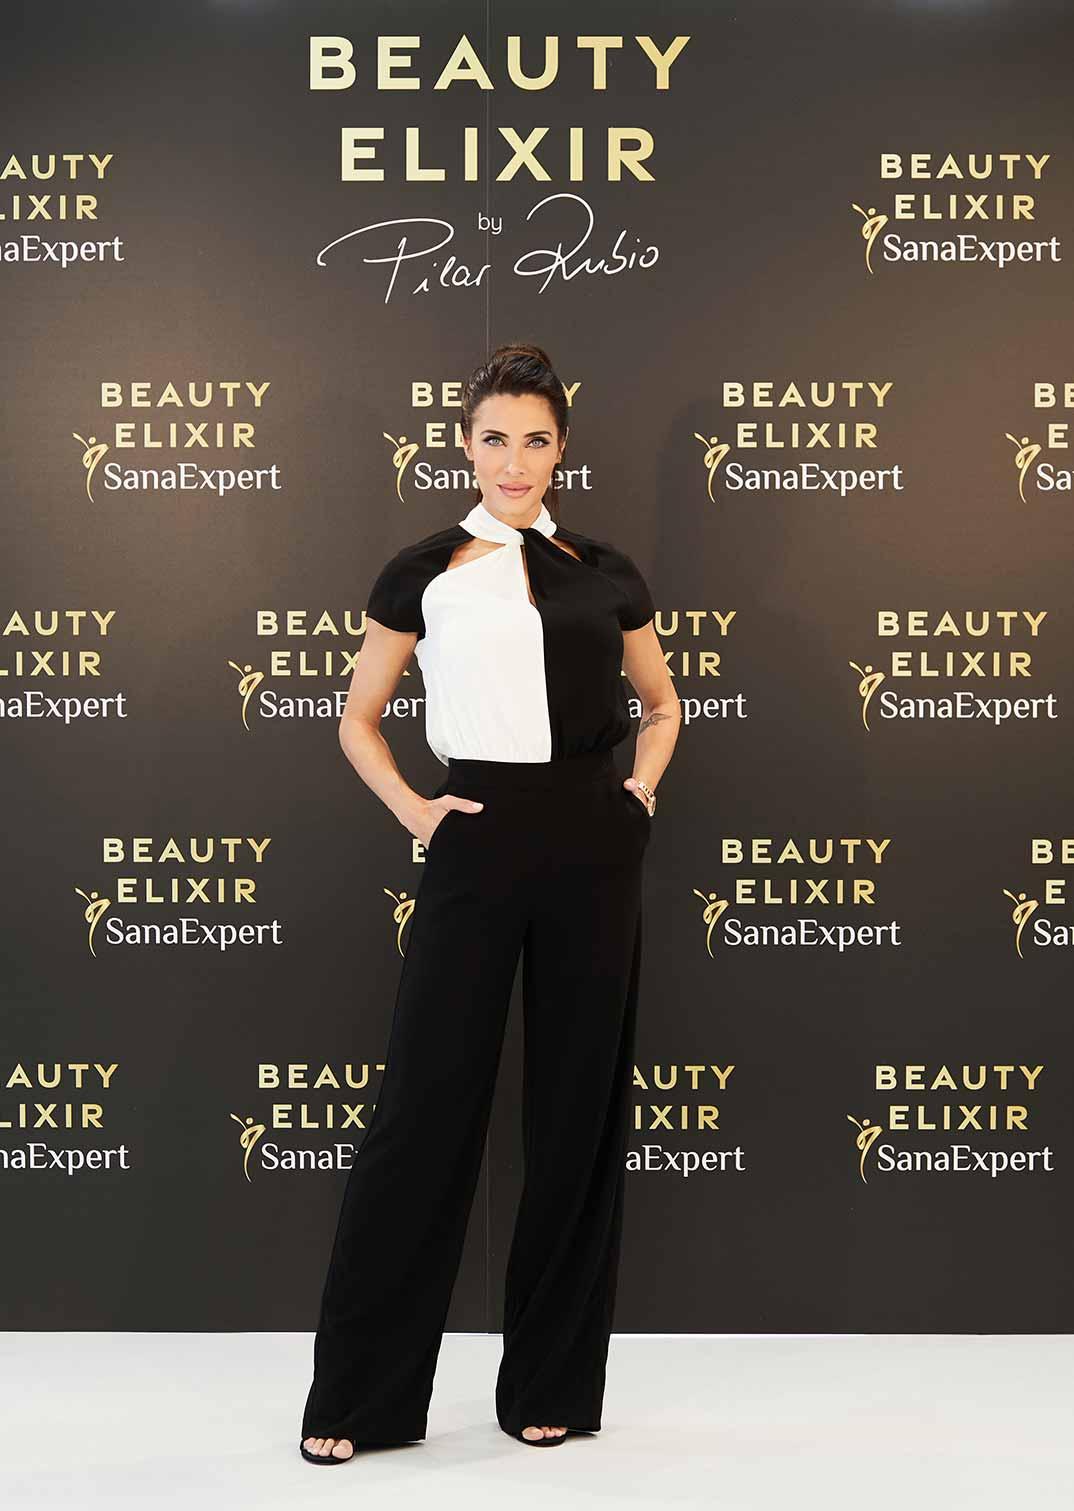 Pilar Rubio - Beauty Elixir SanaExpert